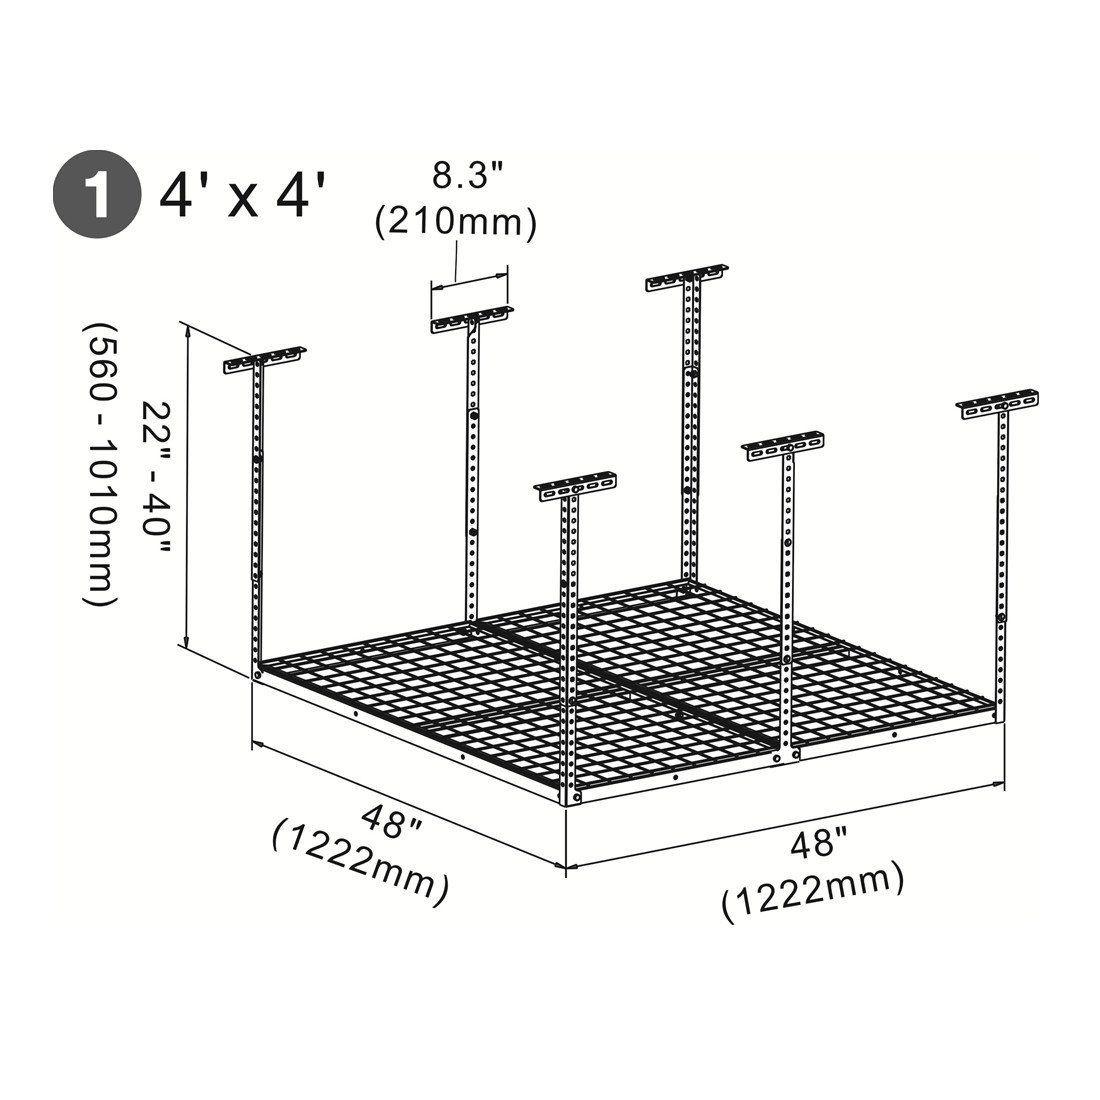 Amazon Com Fleximounts 2x8 4x4 Overhead Garage Storage Rack